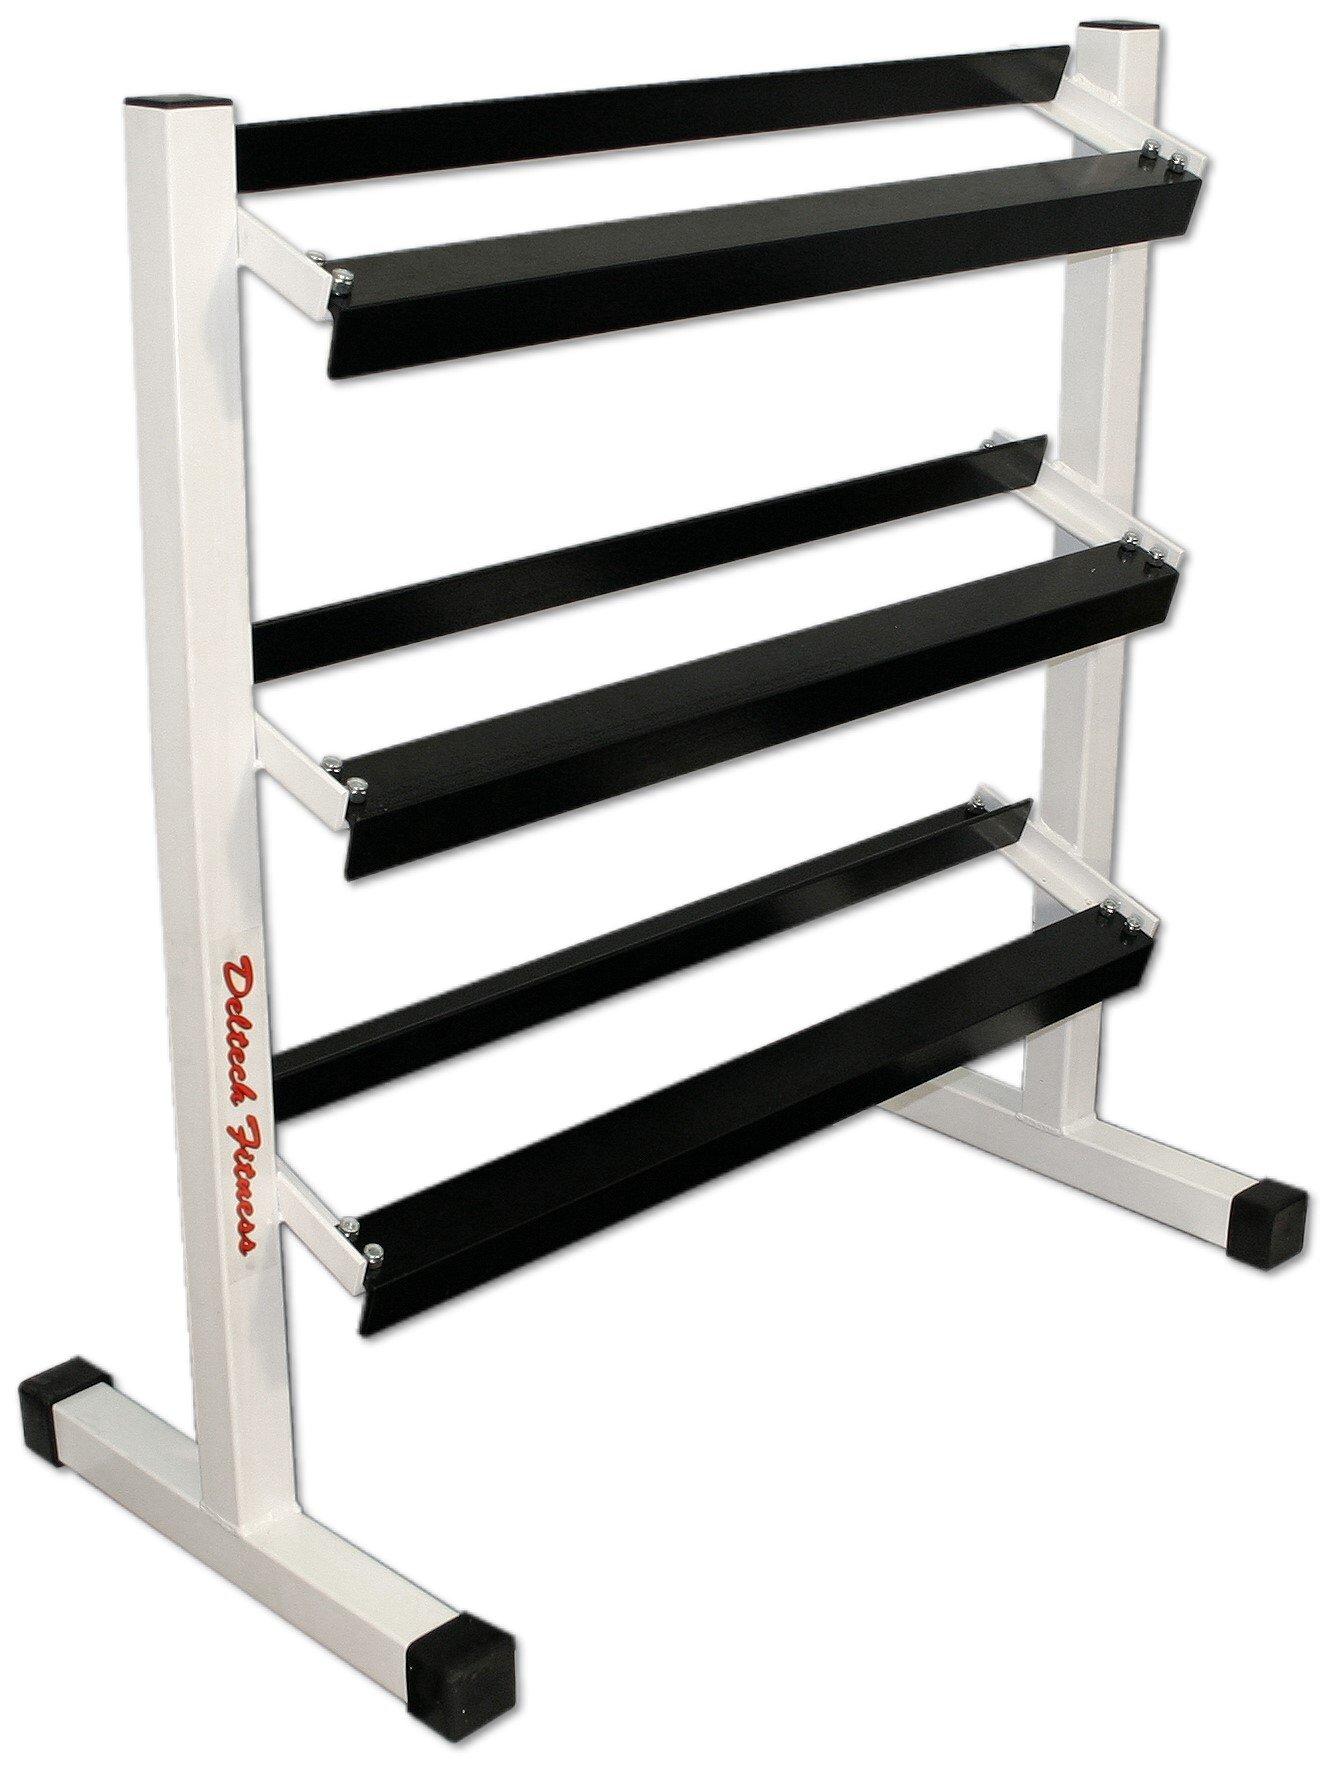 Deltech Fitness Three Tier 36'' Dumbbell Rack